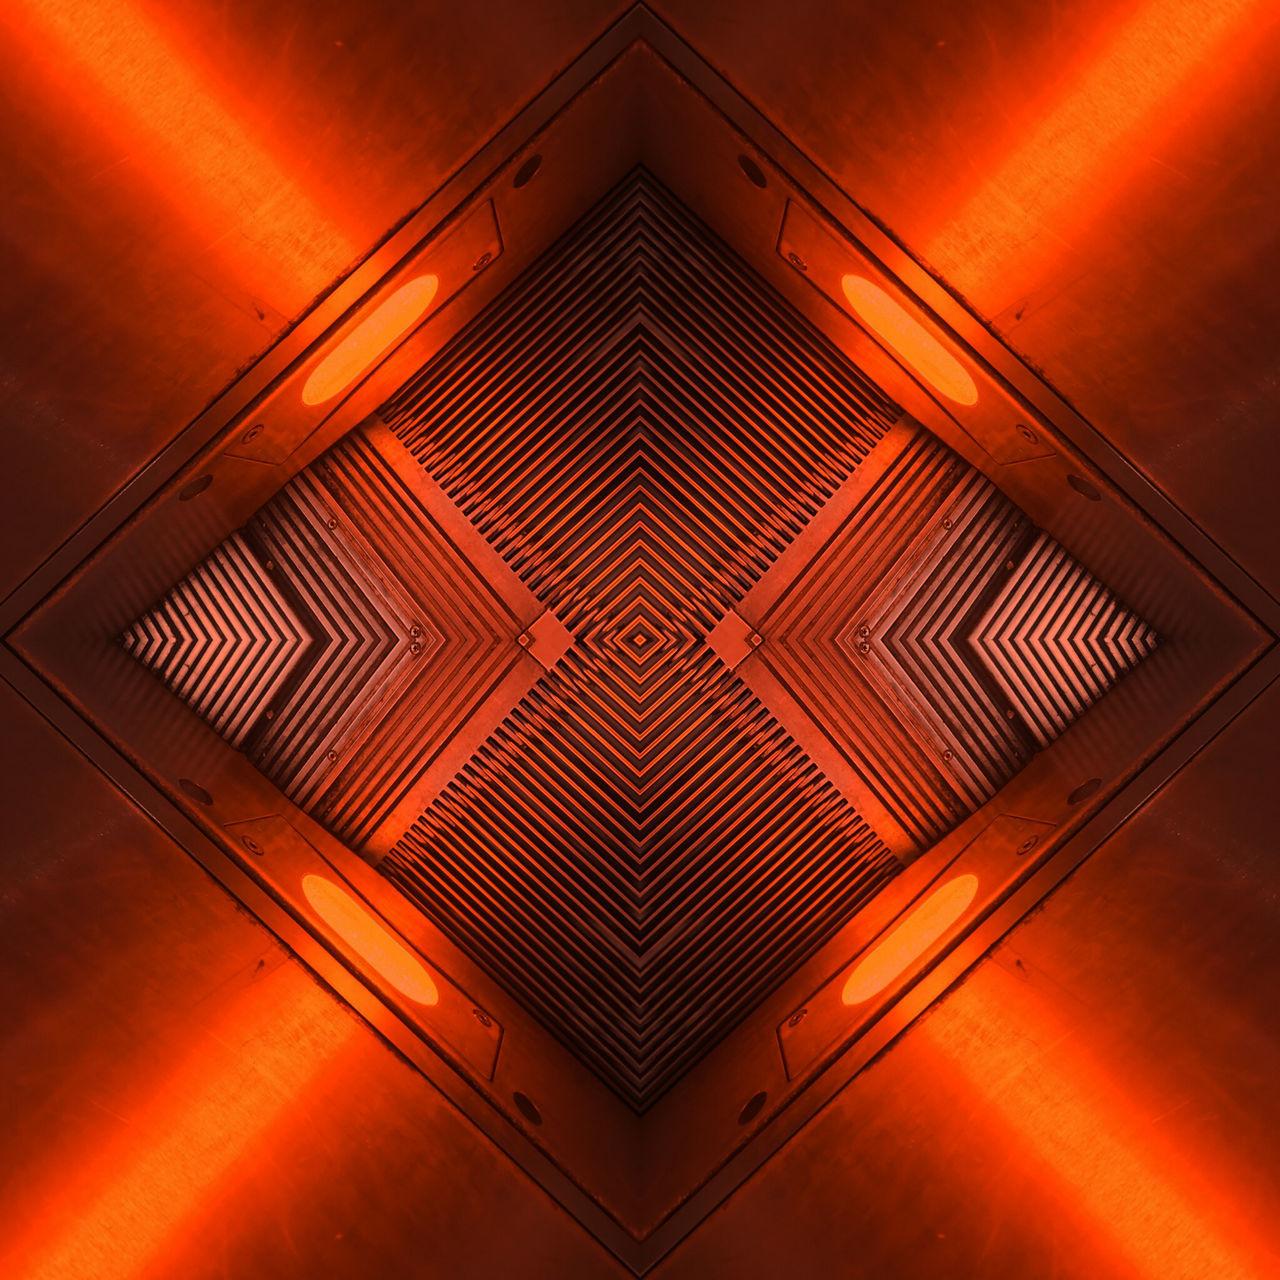 no people, indoors, symmetry, illuminated, close-up